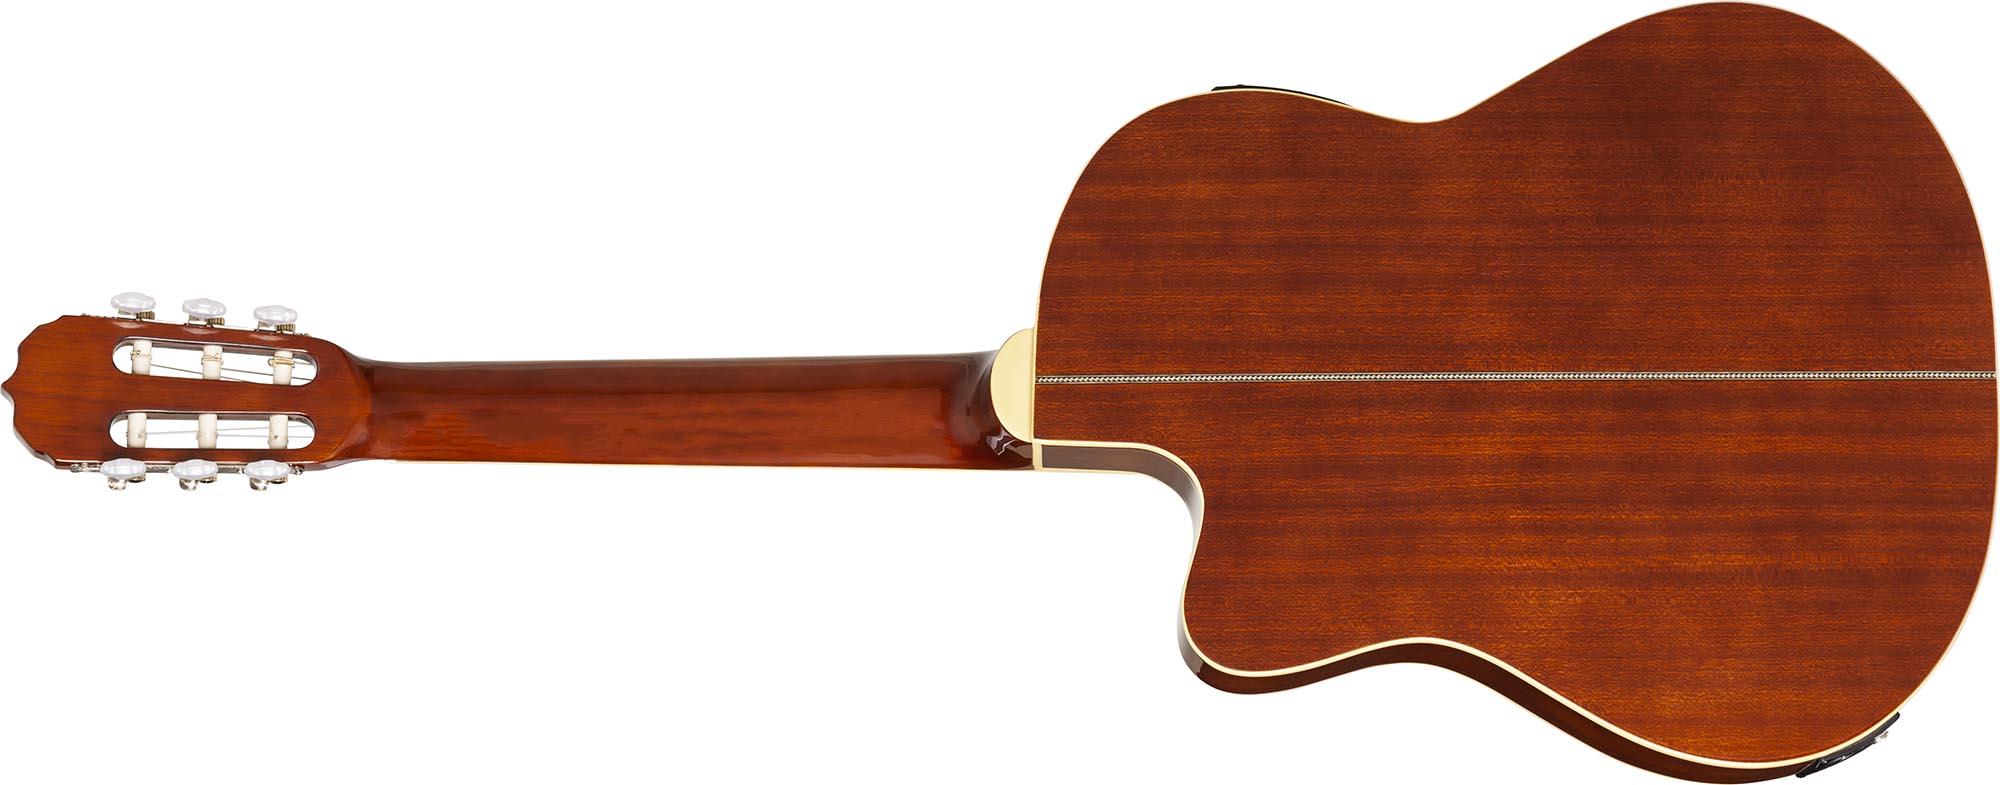 hmc225 violao classico flat hofma hmc225 nt natural visao posterior